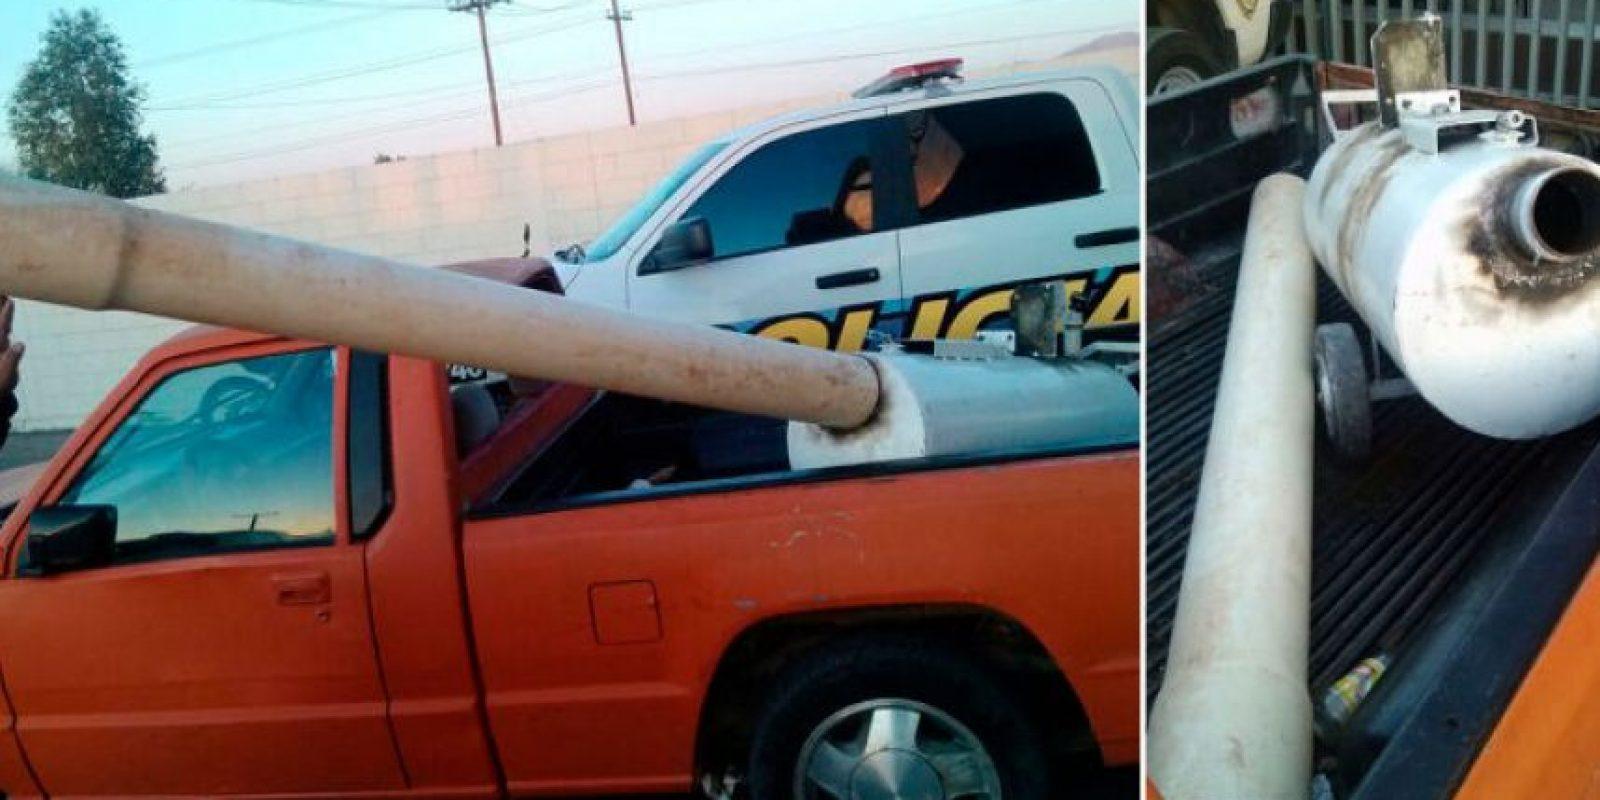 7. Un cañon improvisado que disparaba paquetes de droga. Se descubrió en Mexicali, México Foto:Seguridad Pública Mexicali